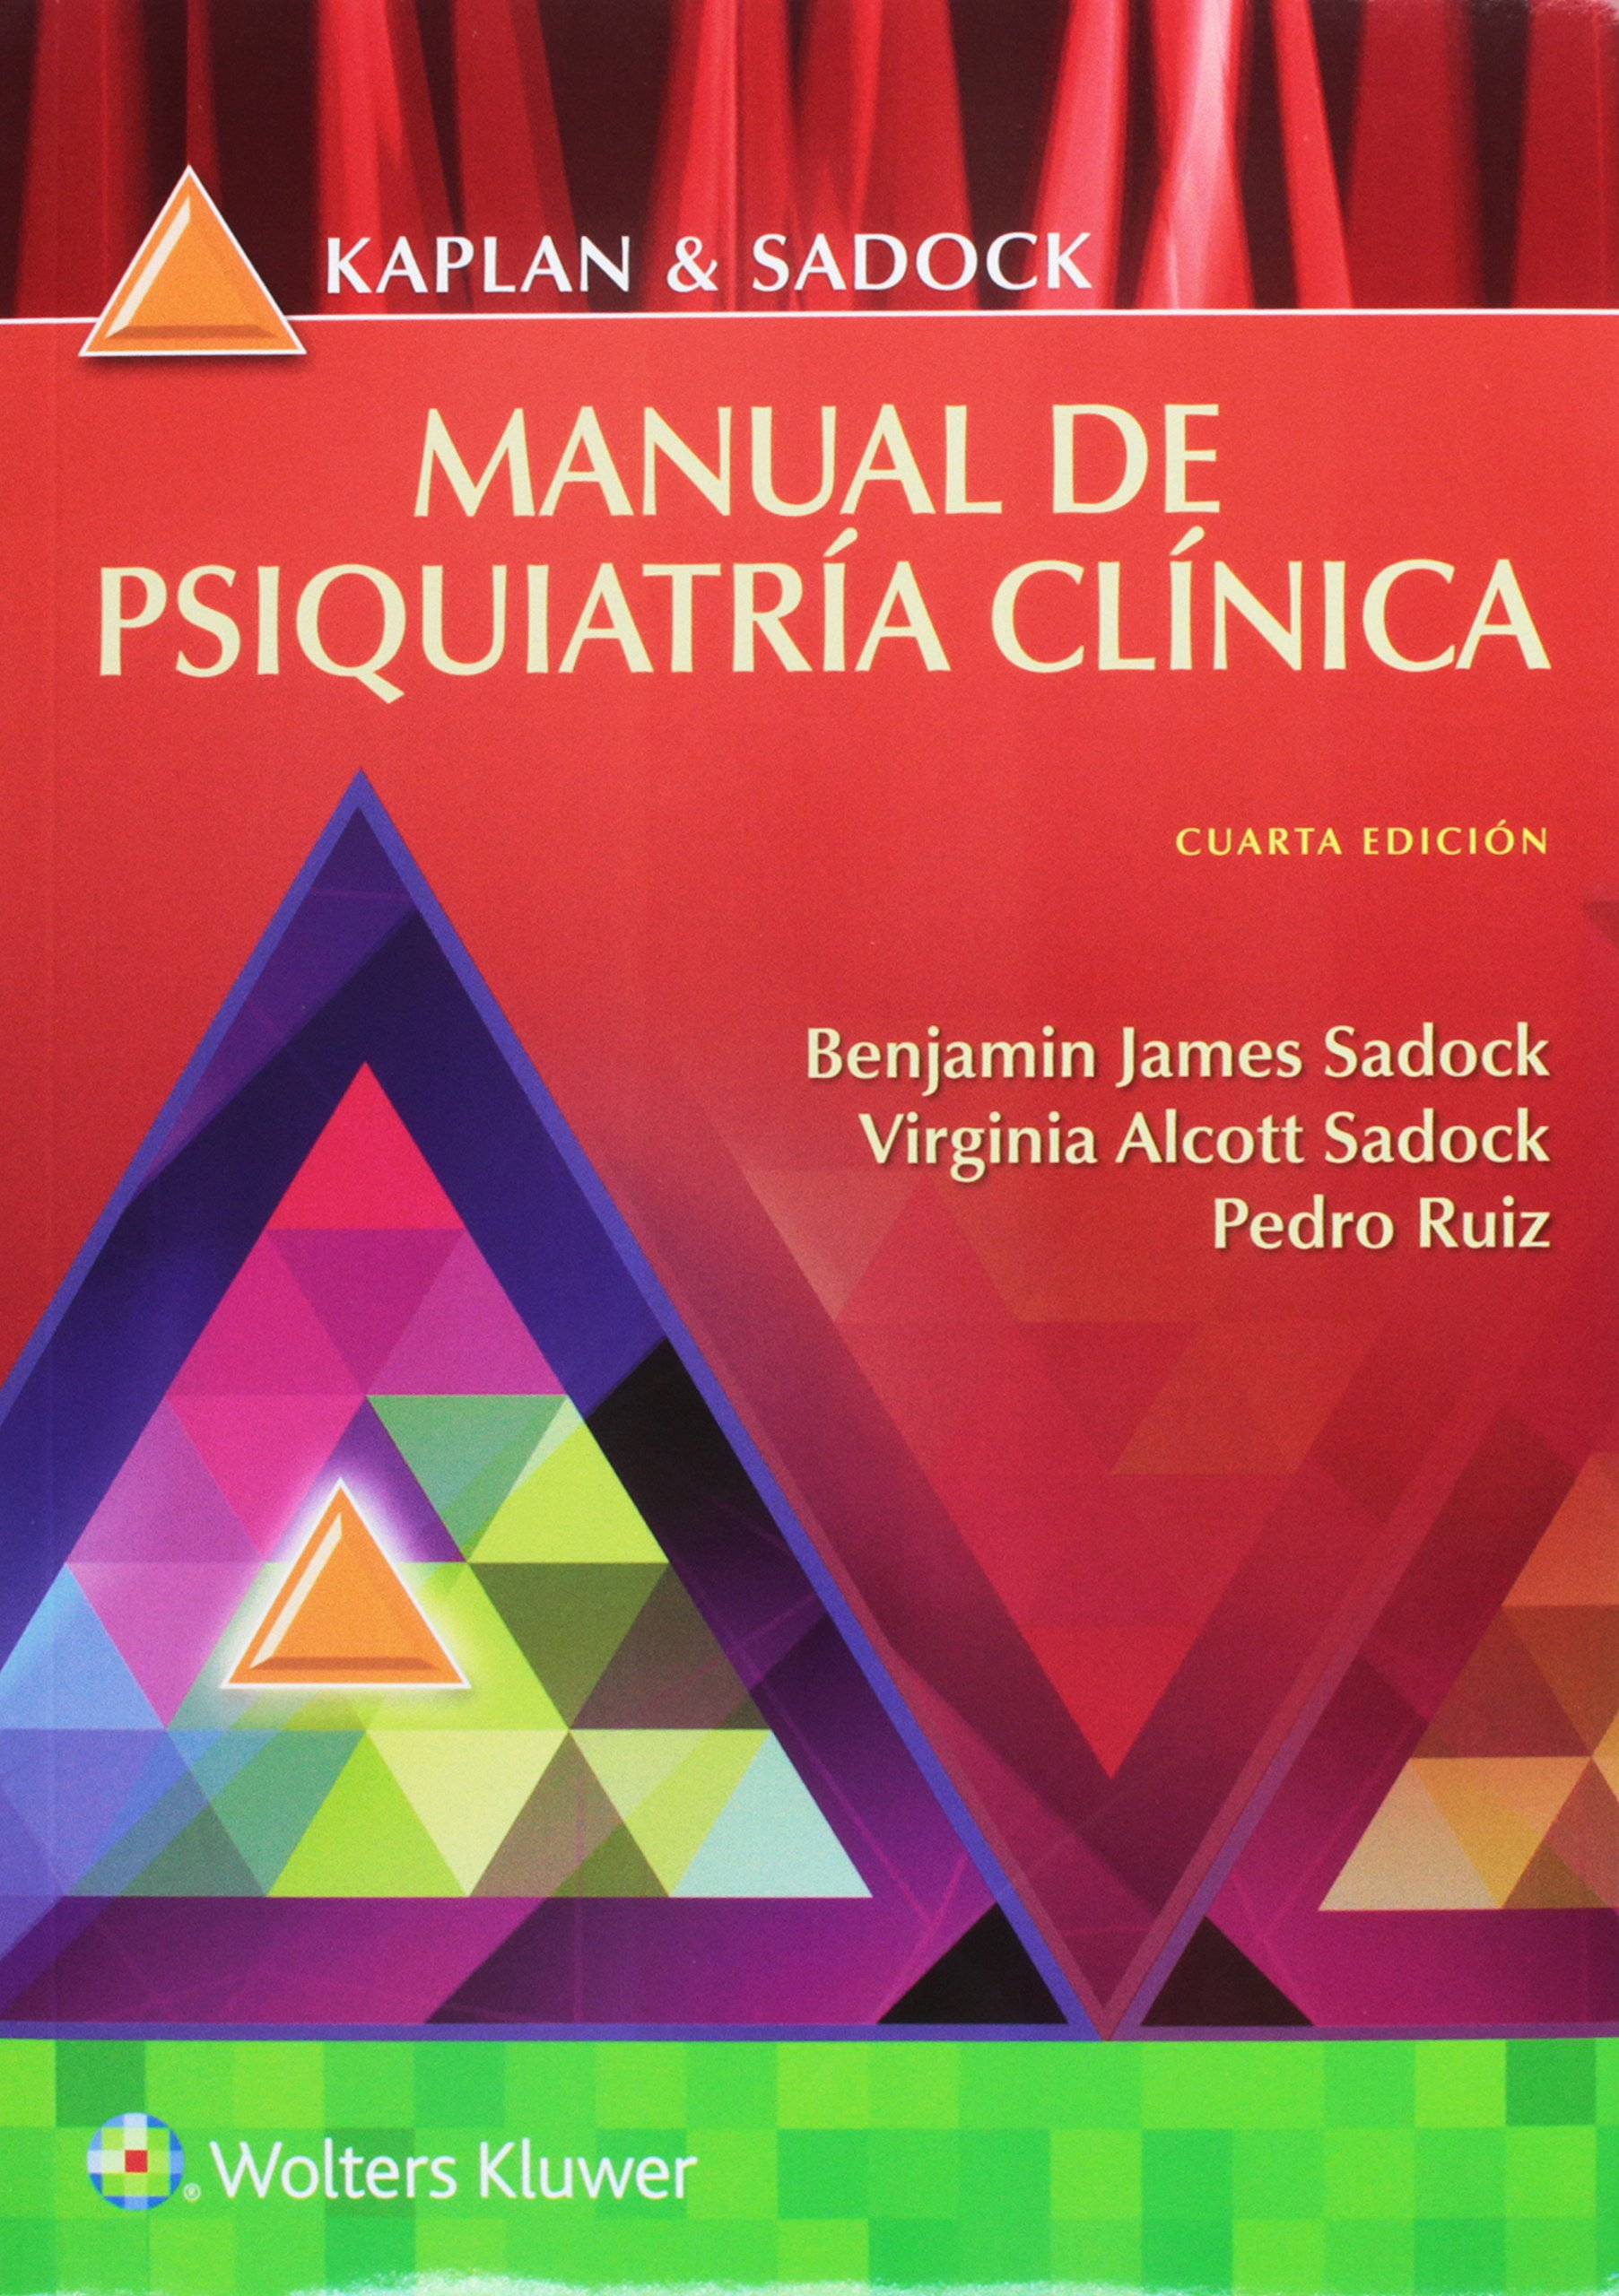 Manual de psiquiatría clínica: Amazon.es: Benjamin Sadock, Virginia A. Sadock, Pedro Ruiz, Neus Lorenzo Galés, Lluís Oms Bernat, Eugènia Ortolà Castells, ...